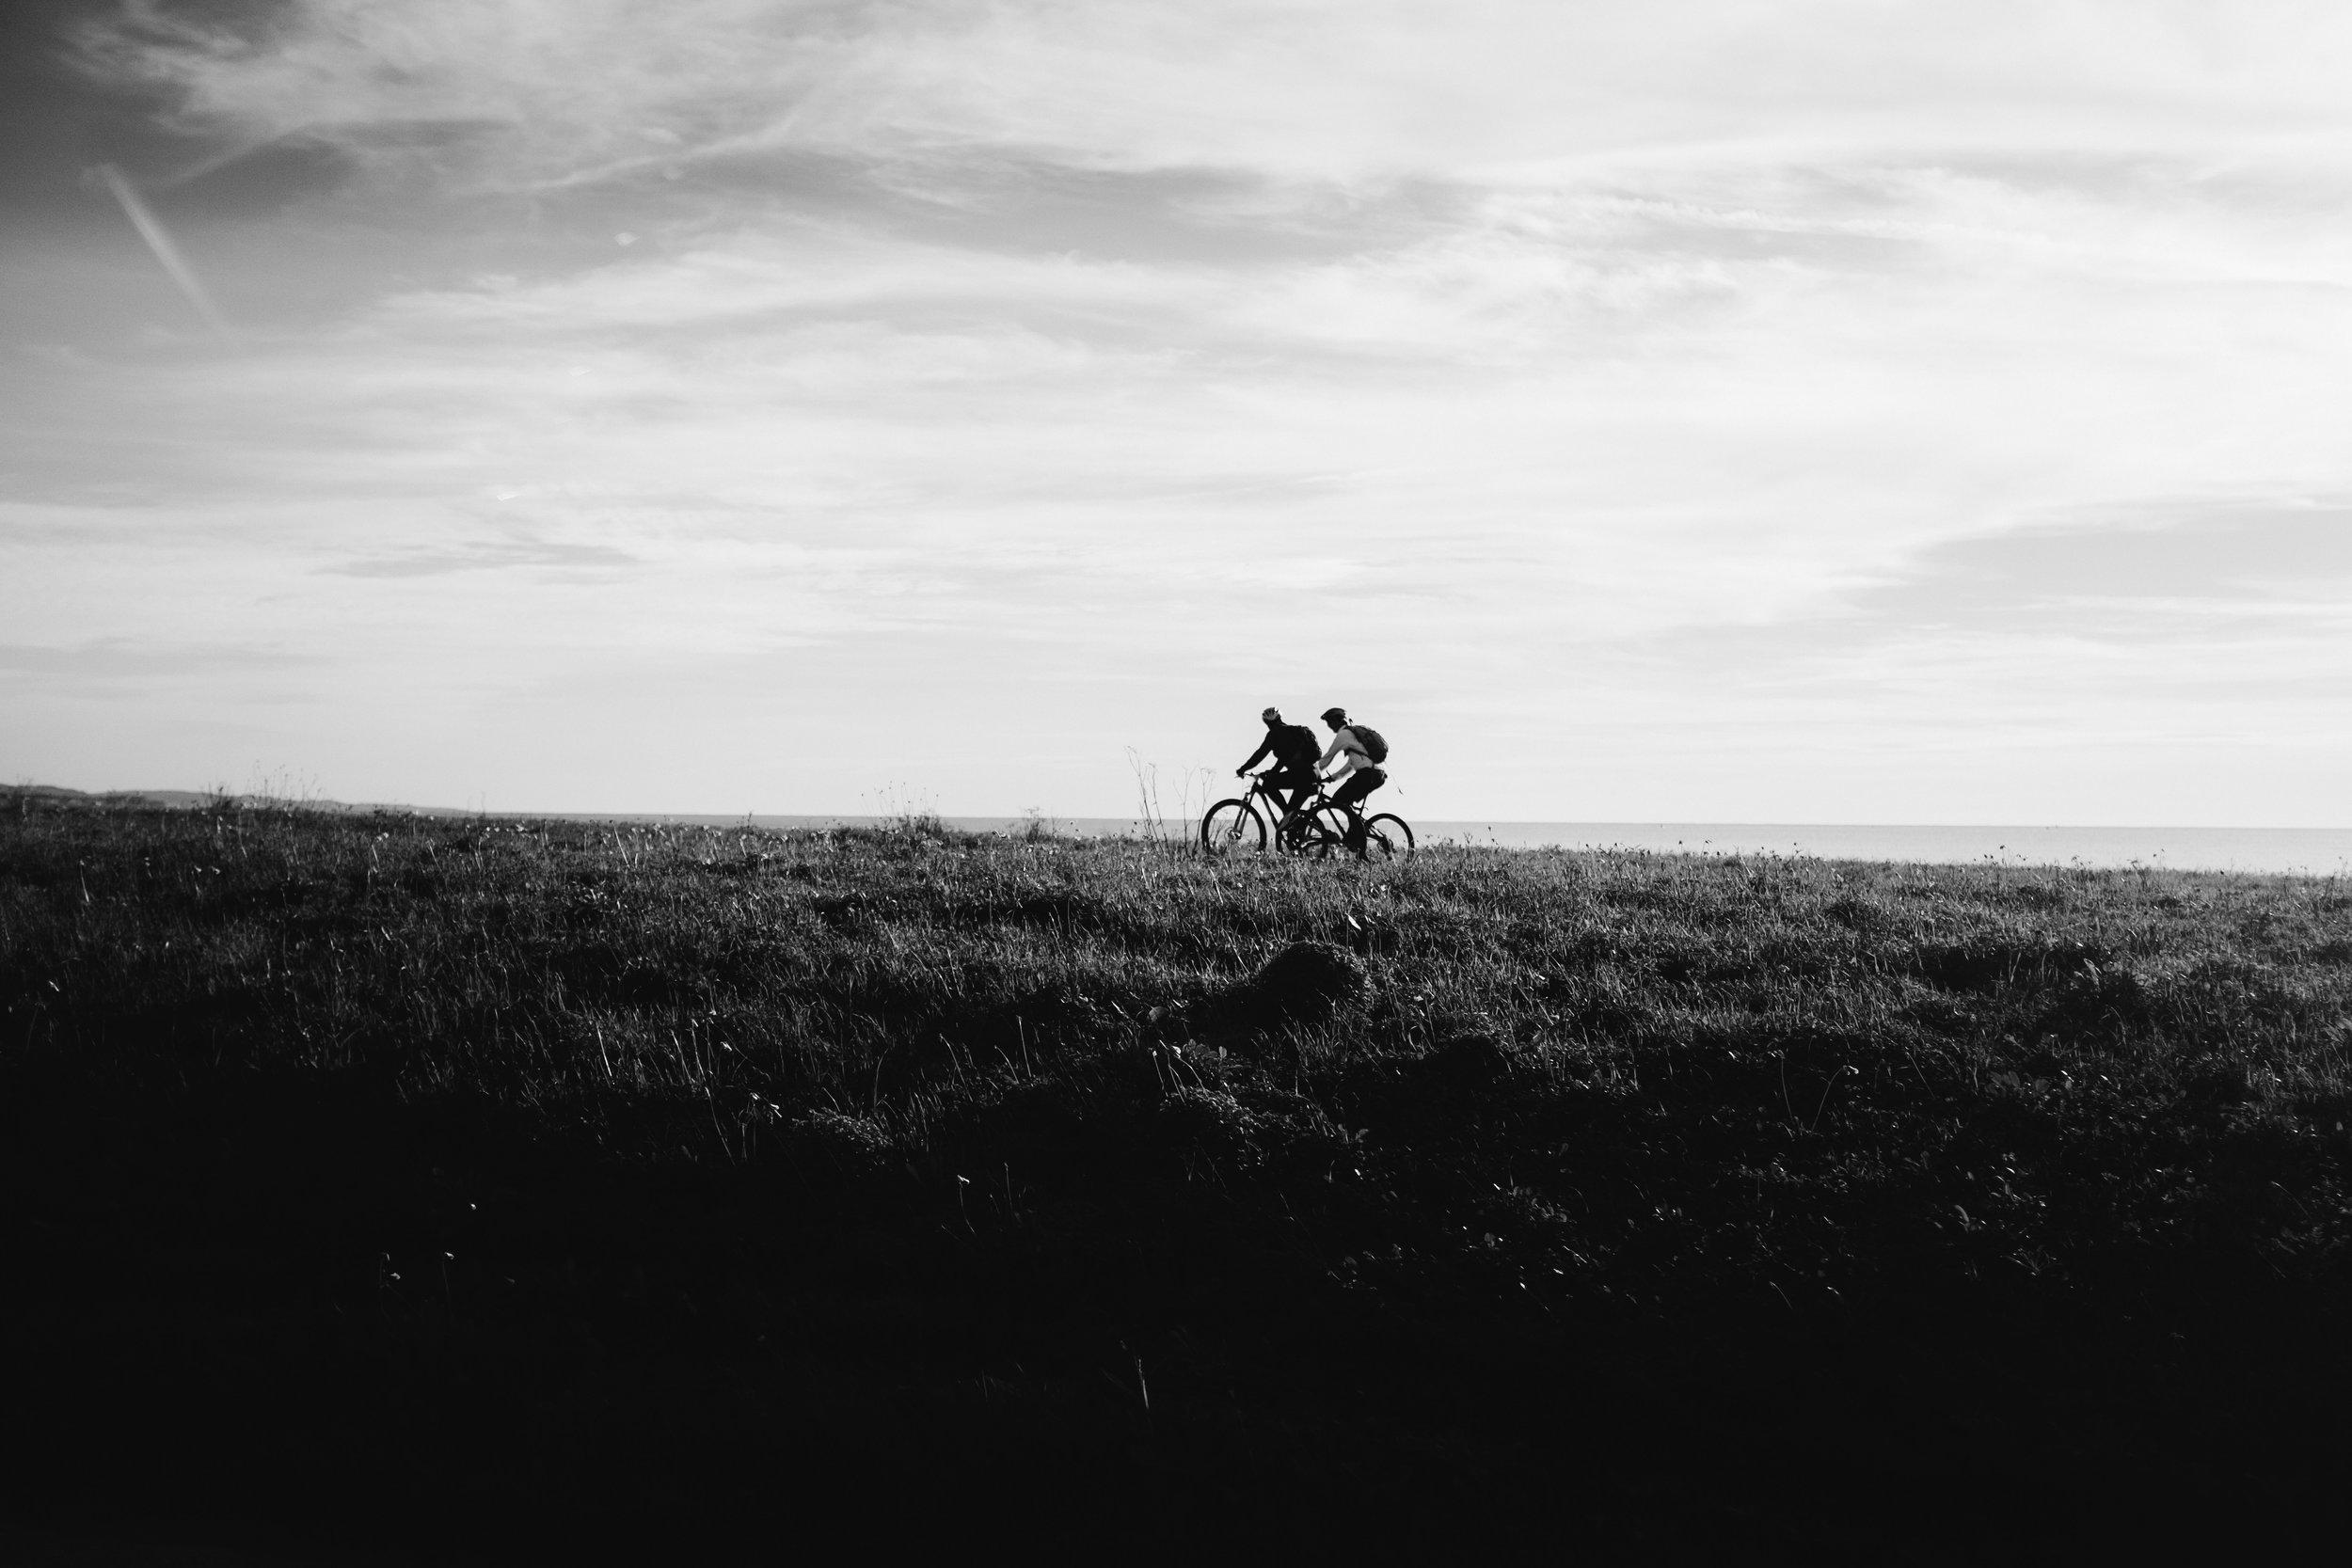 California cyclists Big Sur Toronto Travel Photographers - Suech and Beck